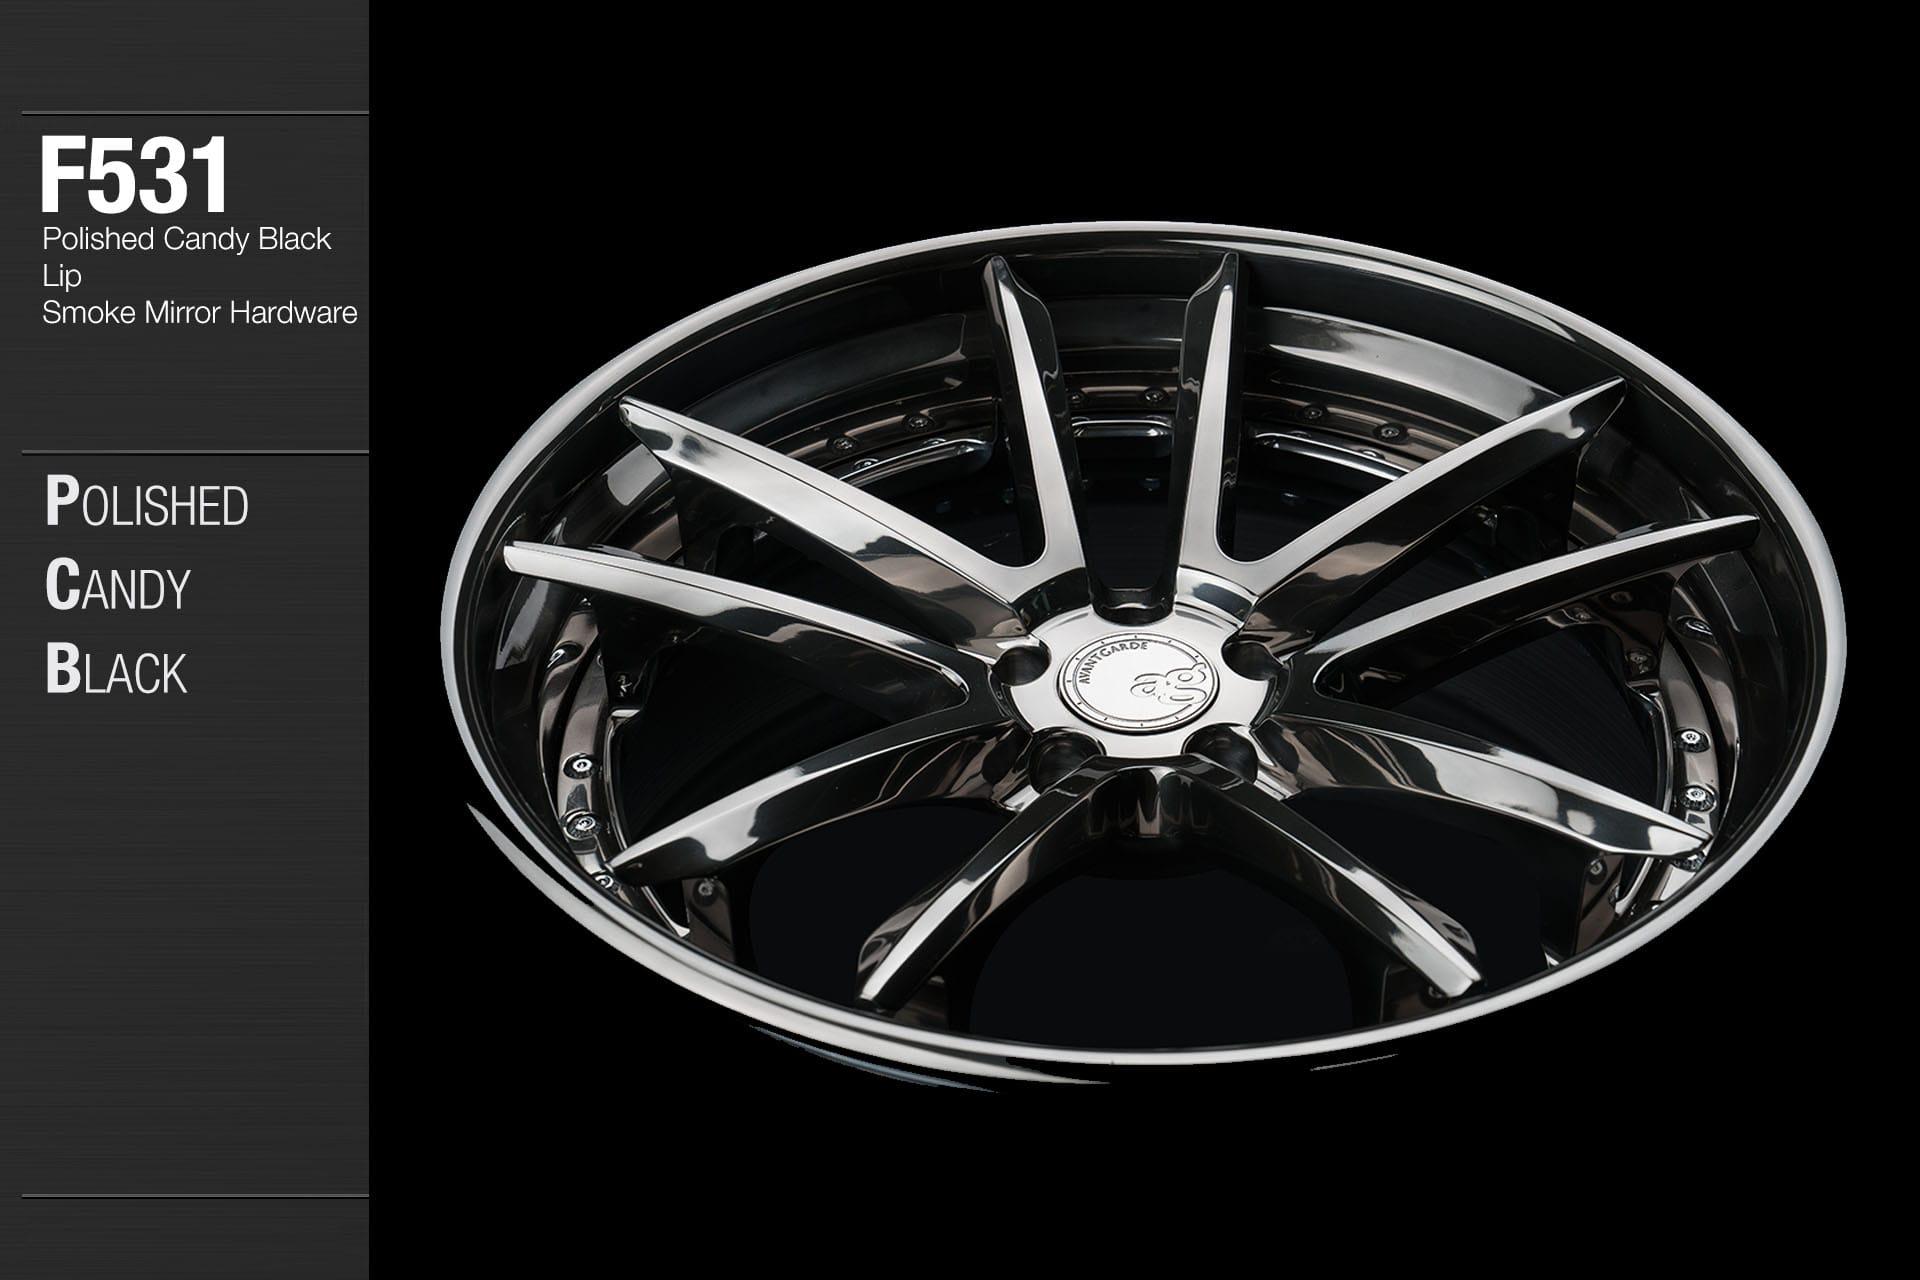 avant-garde-ag-wheels-f531-polished-candy-black-face-lip-smoke-mirror-hardware-3-min